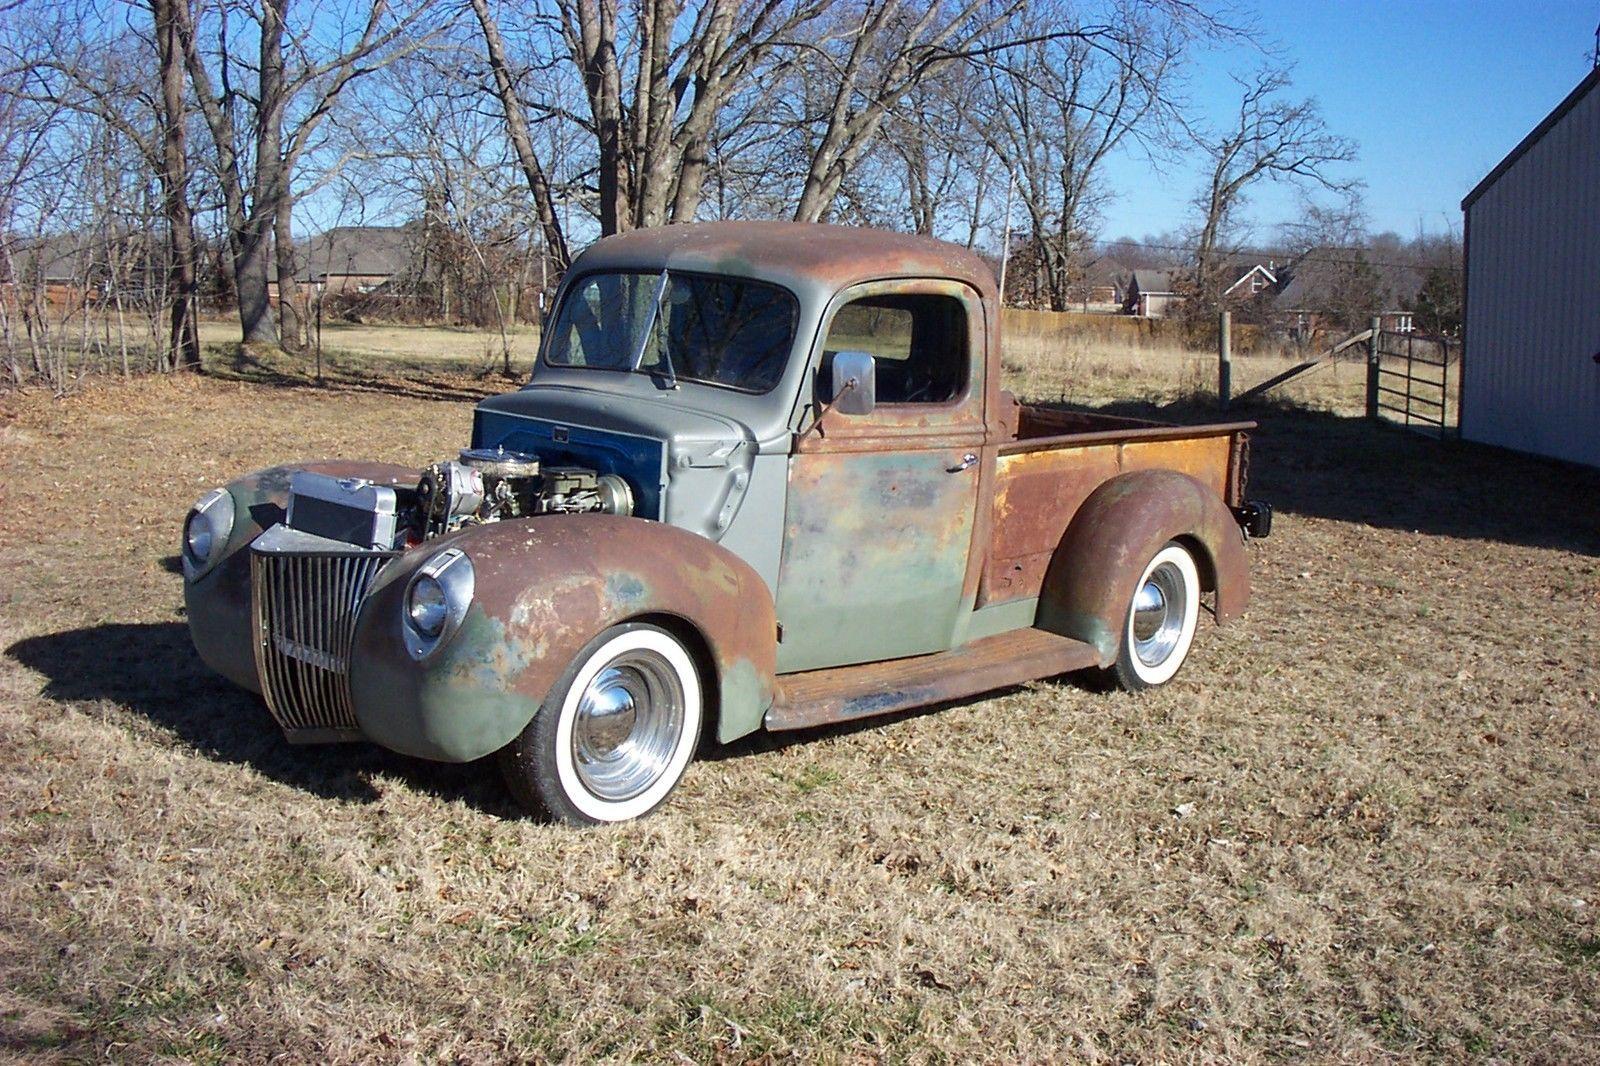 1941 Ford Pickup Hot Rodrat Rodfarm Truck Favorite Build Vin Location